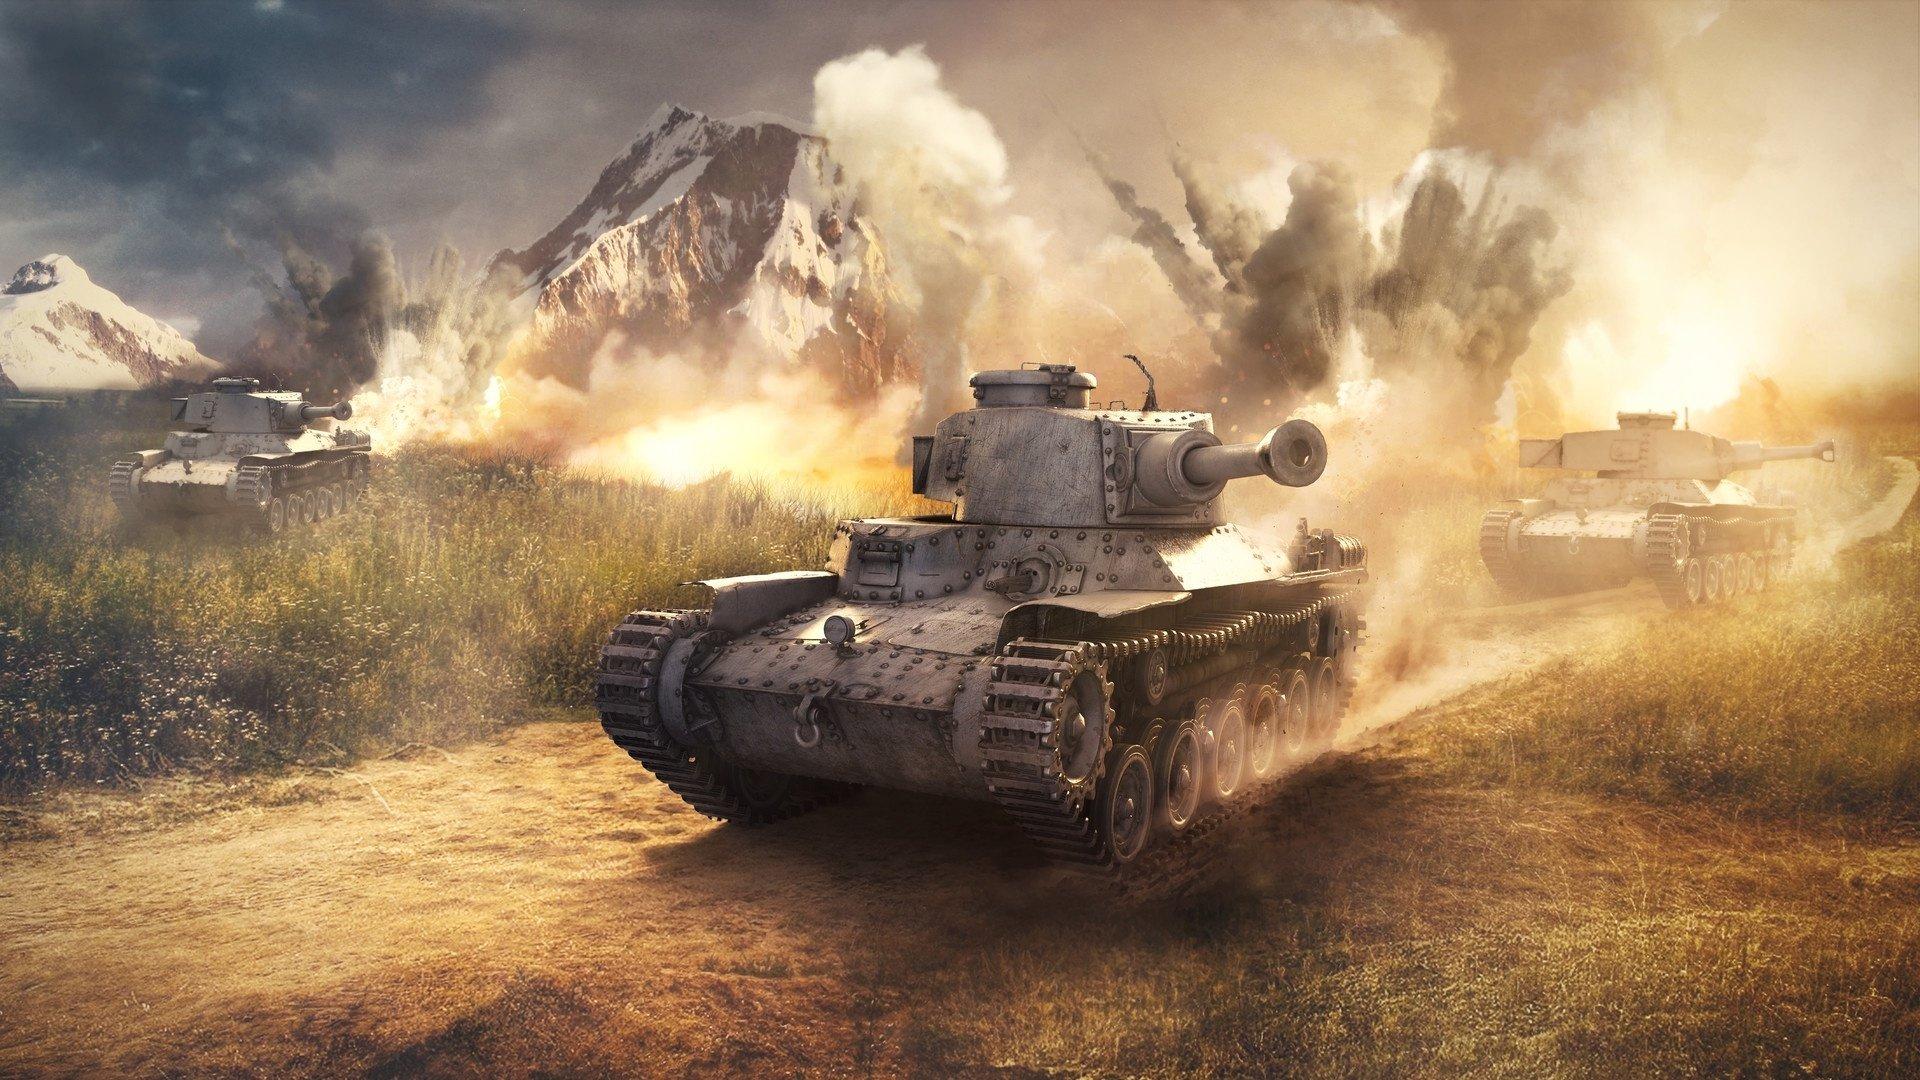 War Thunder HD Wallpaper | Background Image | 1920x1080 | ID:882784 - Wallpaper Abyss